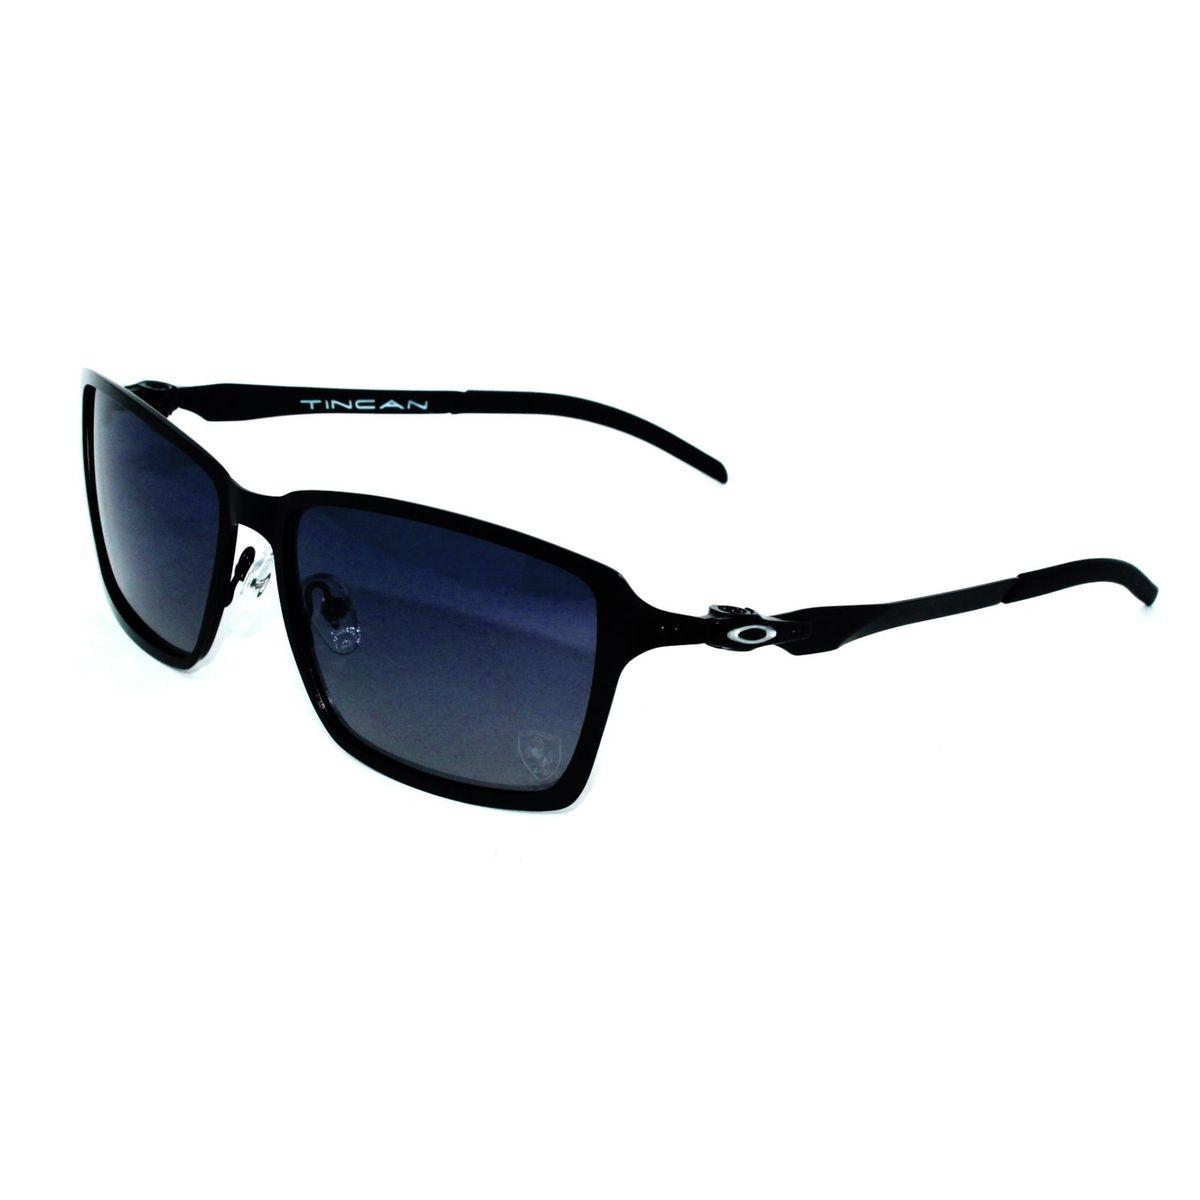 f55727284 Óculos Oakley Tincan Ferrari 100% Polarizado Promoção!!! | Óculos Masculino  Oakley Nunca Usado 23000250 | enjoei